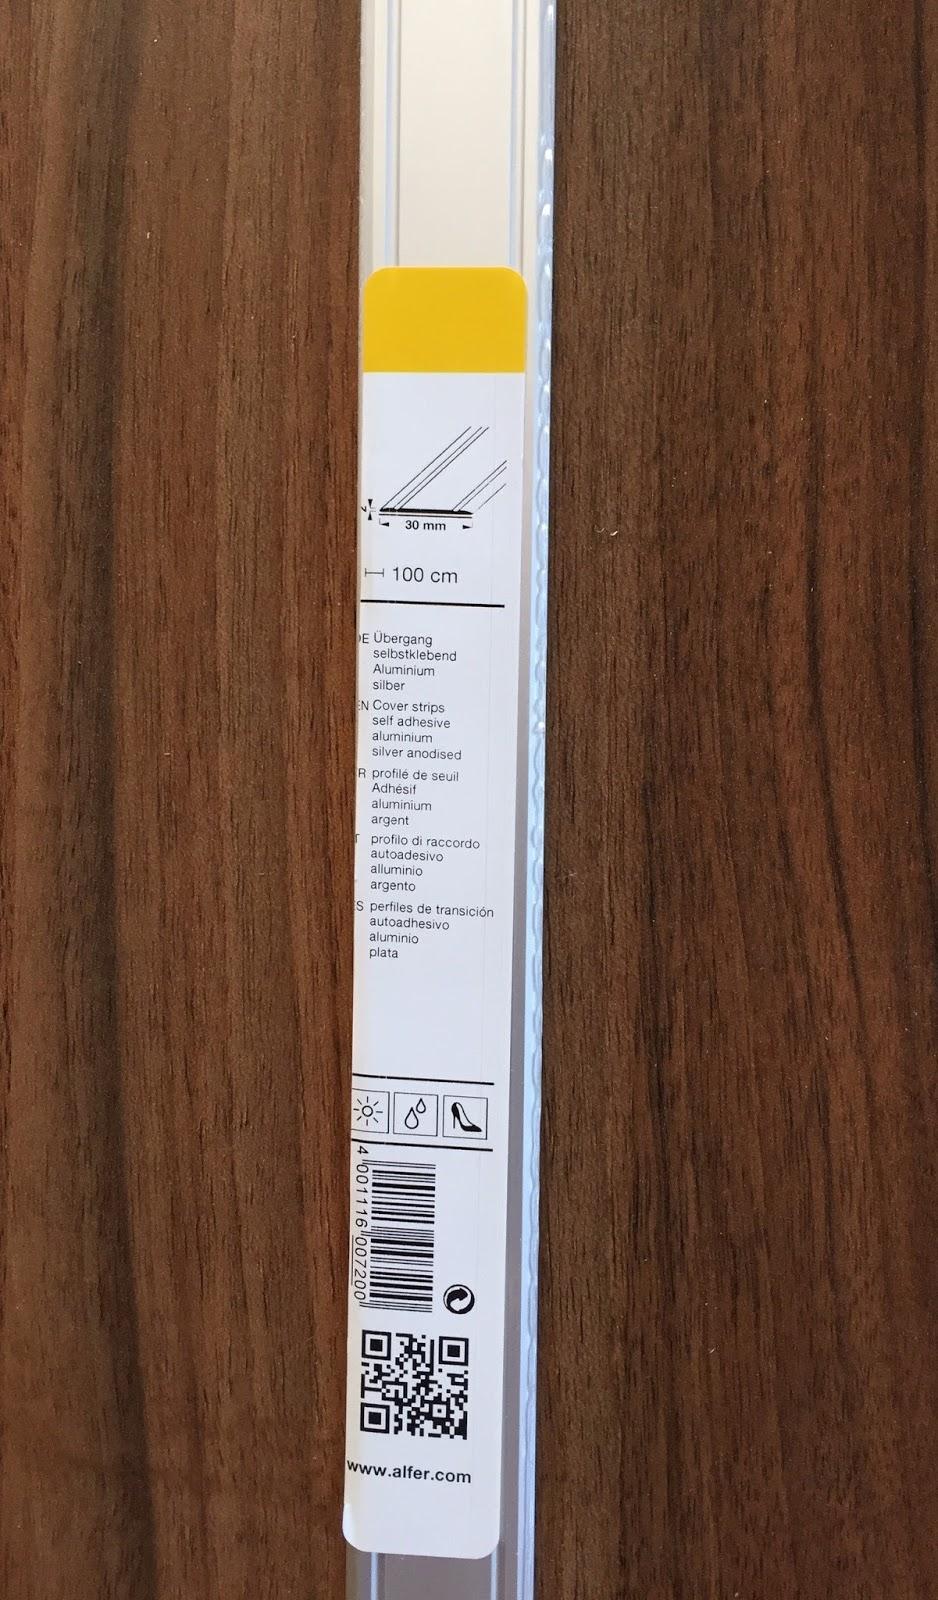 Berühmt Meine Produkttests: GedoTec® Übergangsprofil selbstklebend SC48